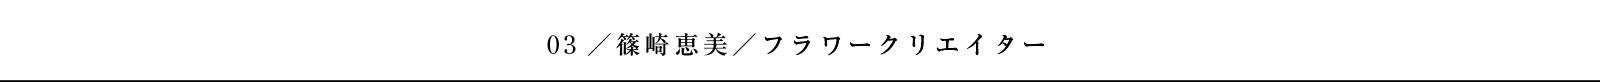 ts2_btn3